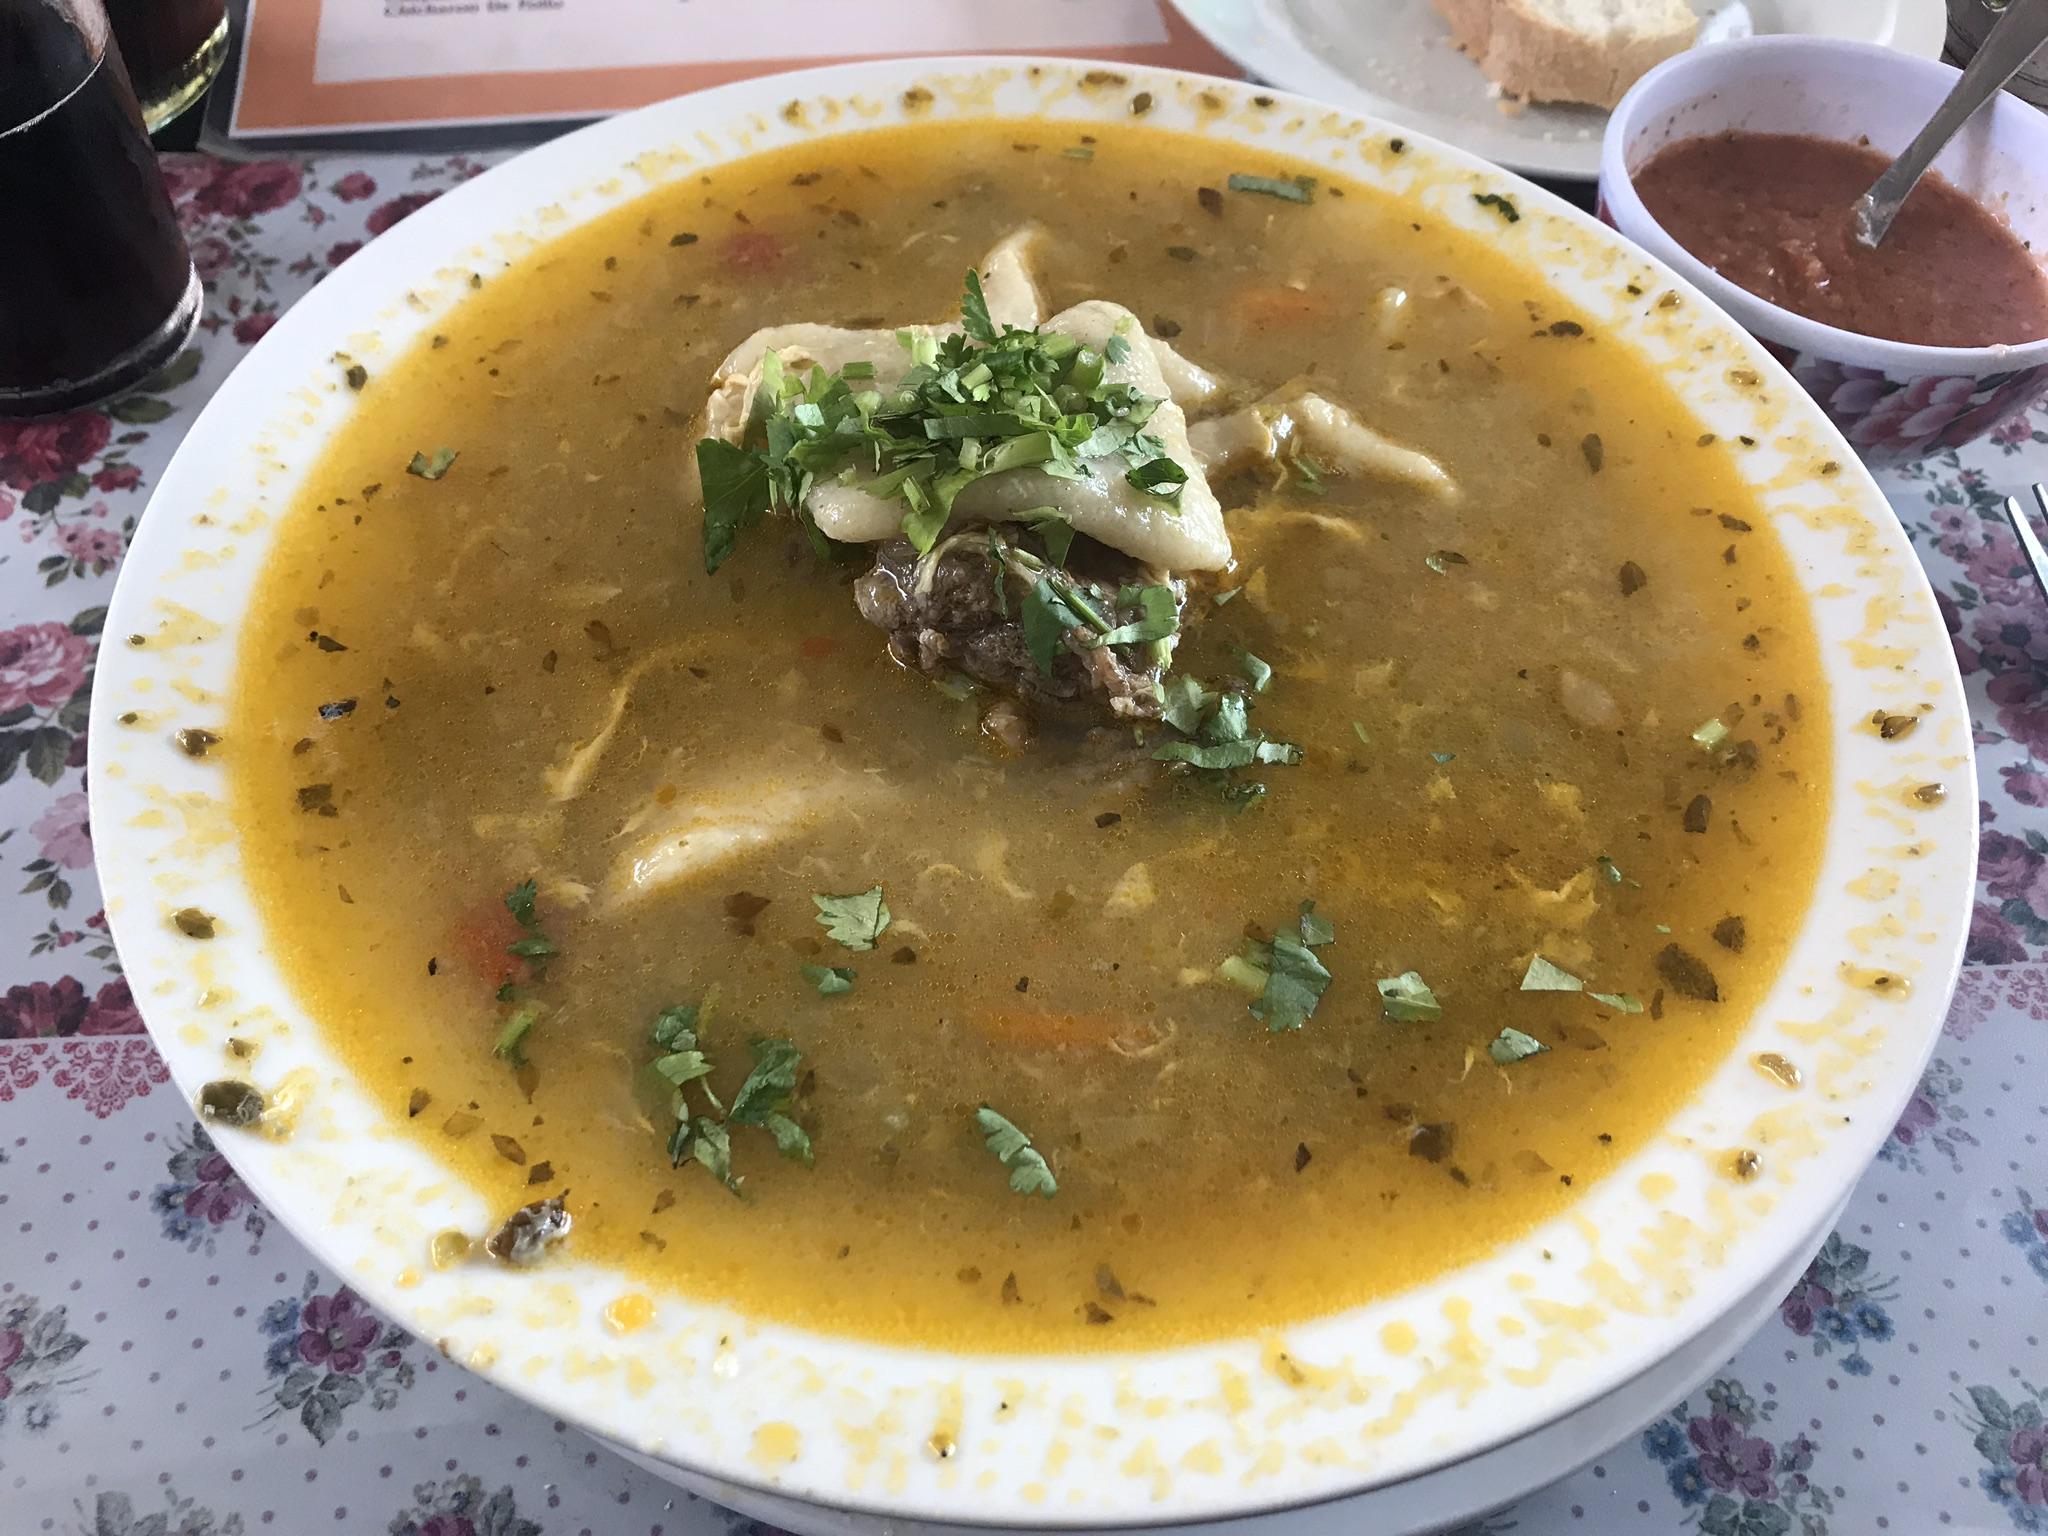 Comida típica chilena | Mi Blog de Aventuras | 2019